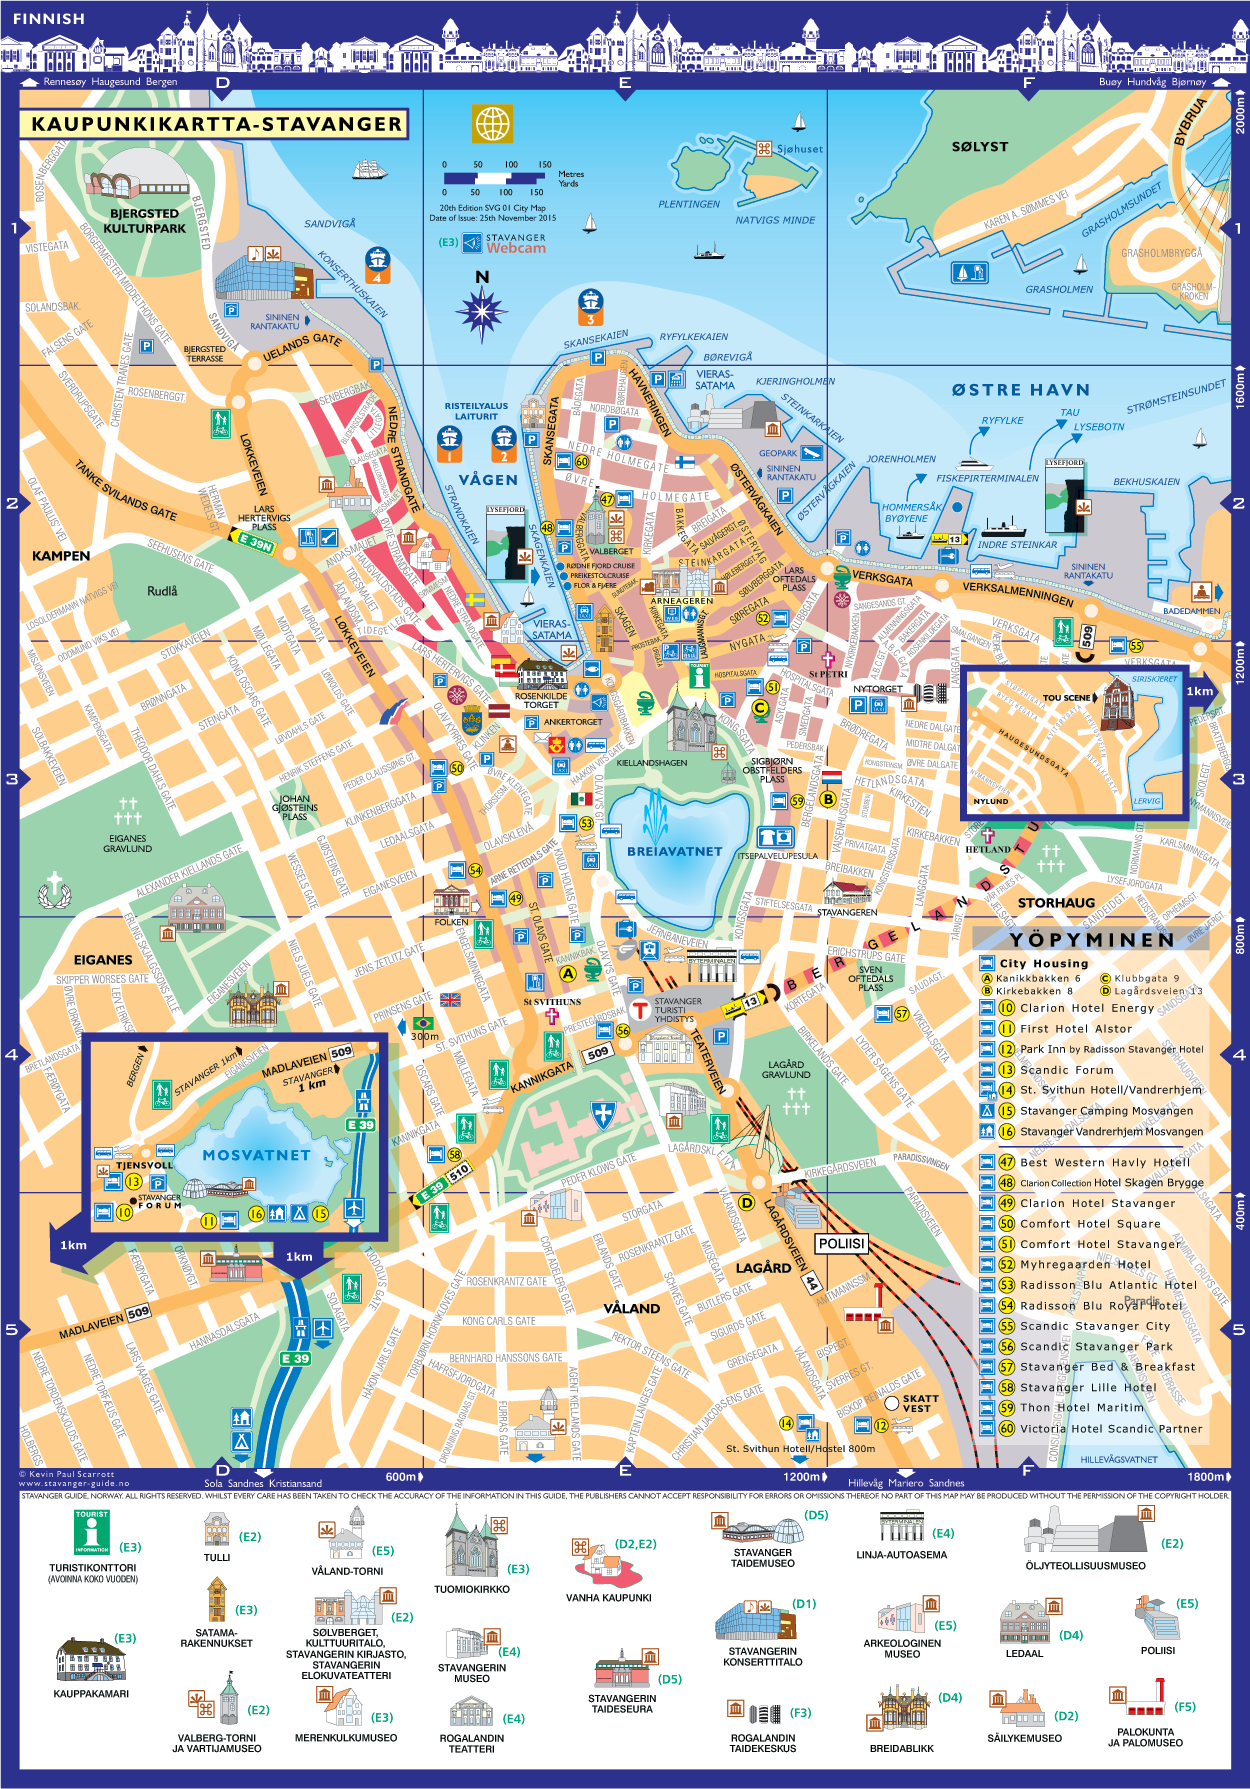 Stavanger kaupunginkartta